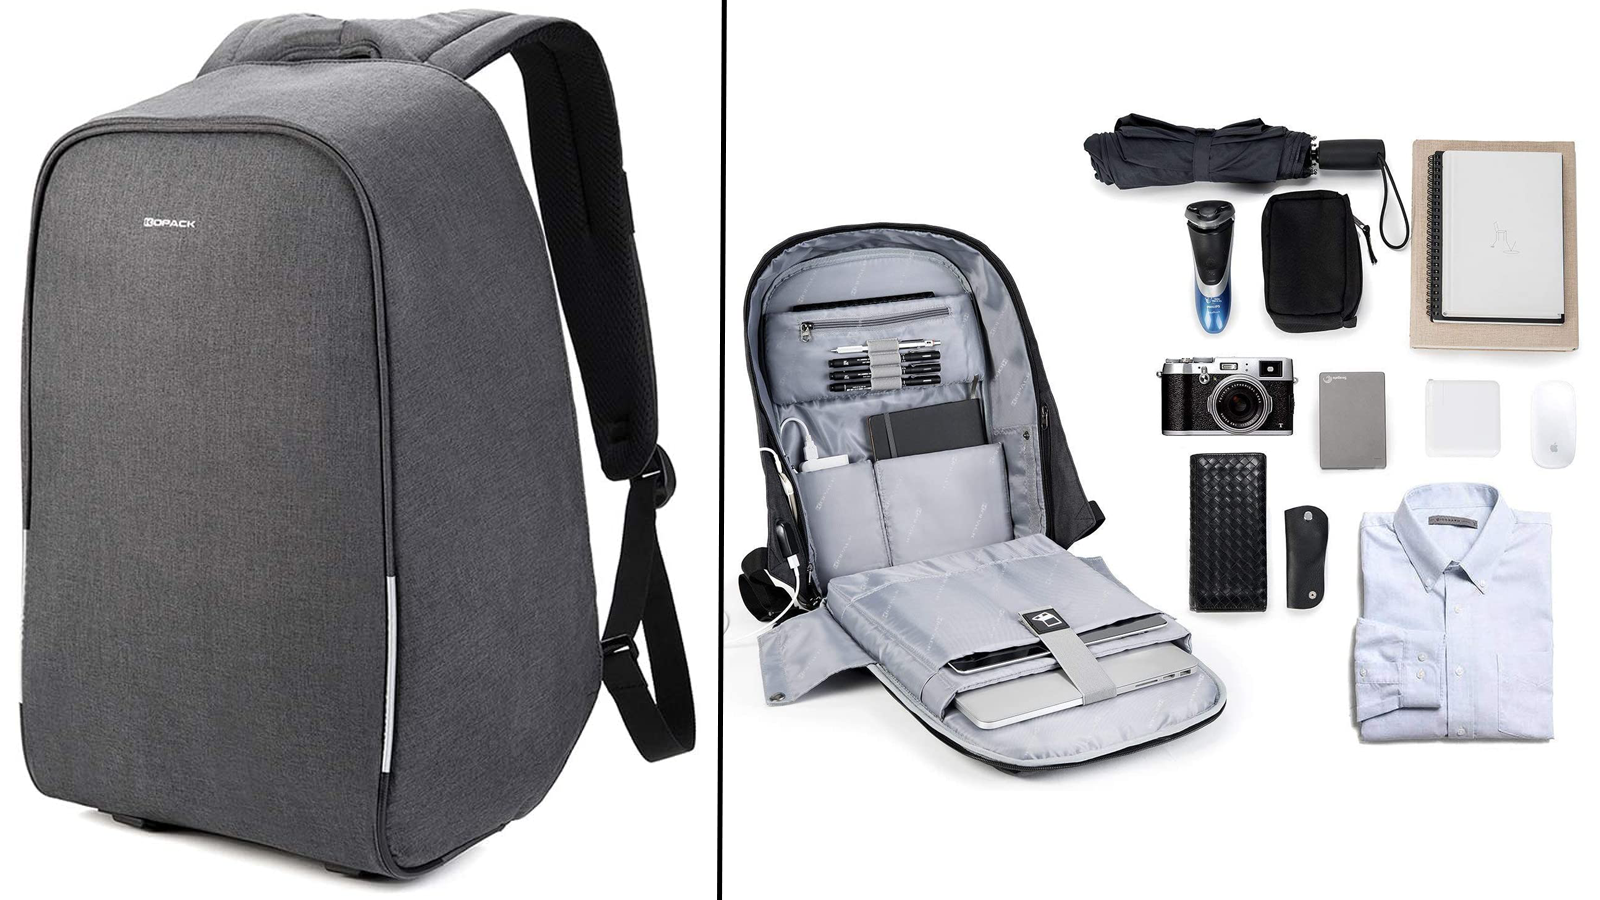 KOPACK Scan Smart Anti-Theft Laptop Backpack